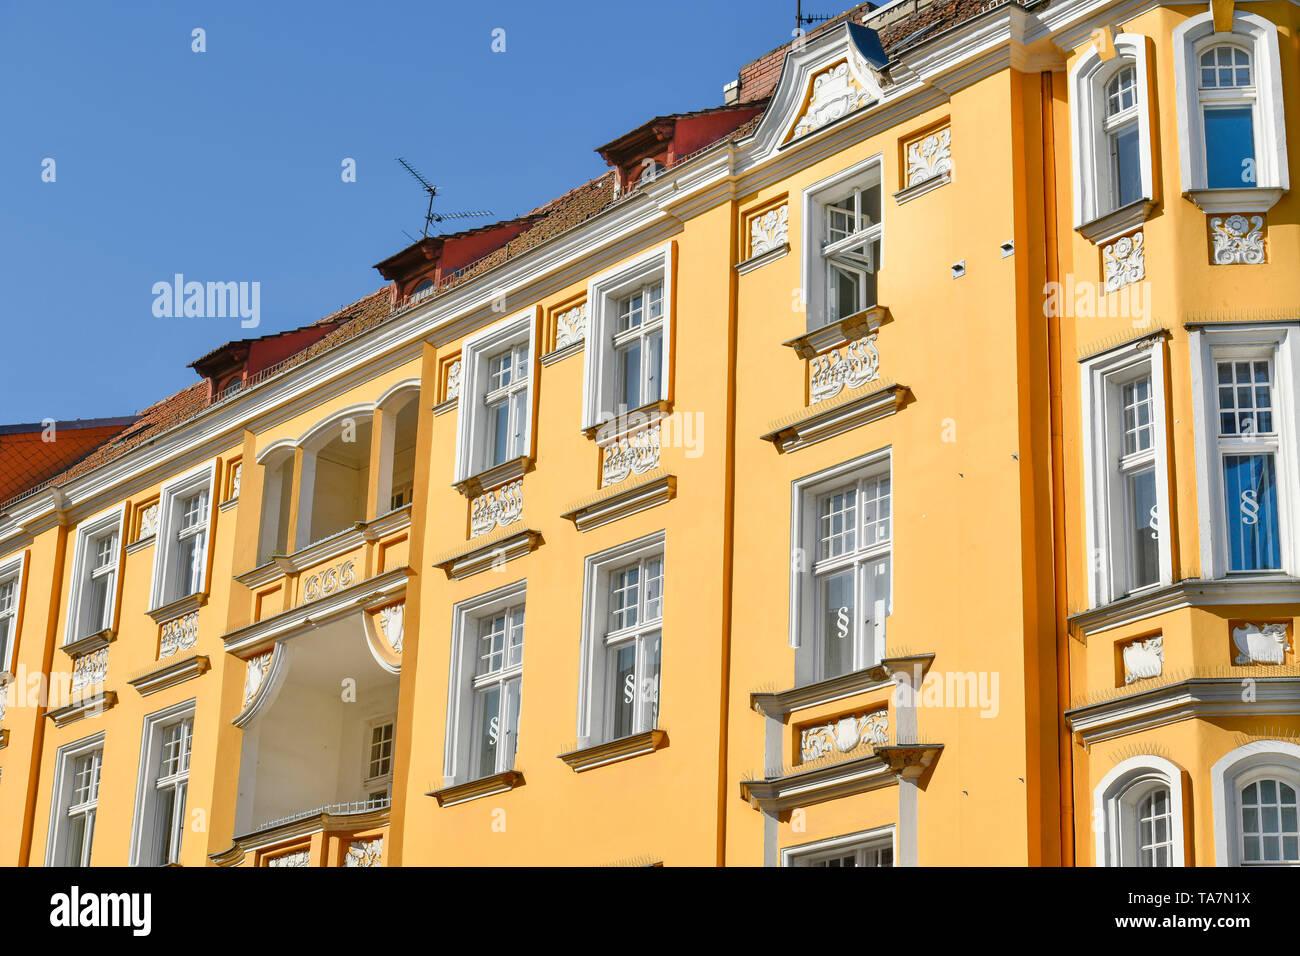 Old building, Charlottenstrasse, Old Town, Spandau, Berlin, Germany, Altbau, Charlottenstraße, Altstadt, Deutschland - Stock Image